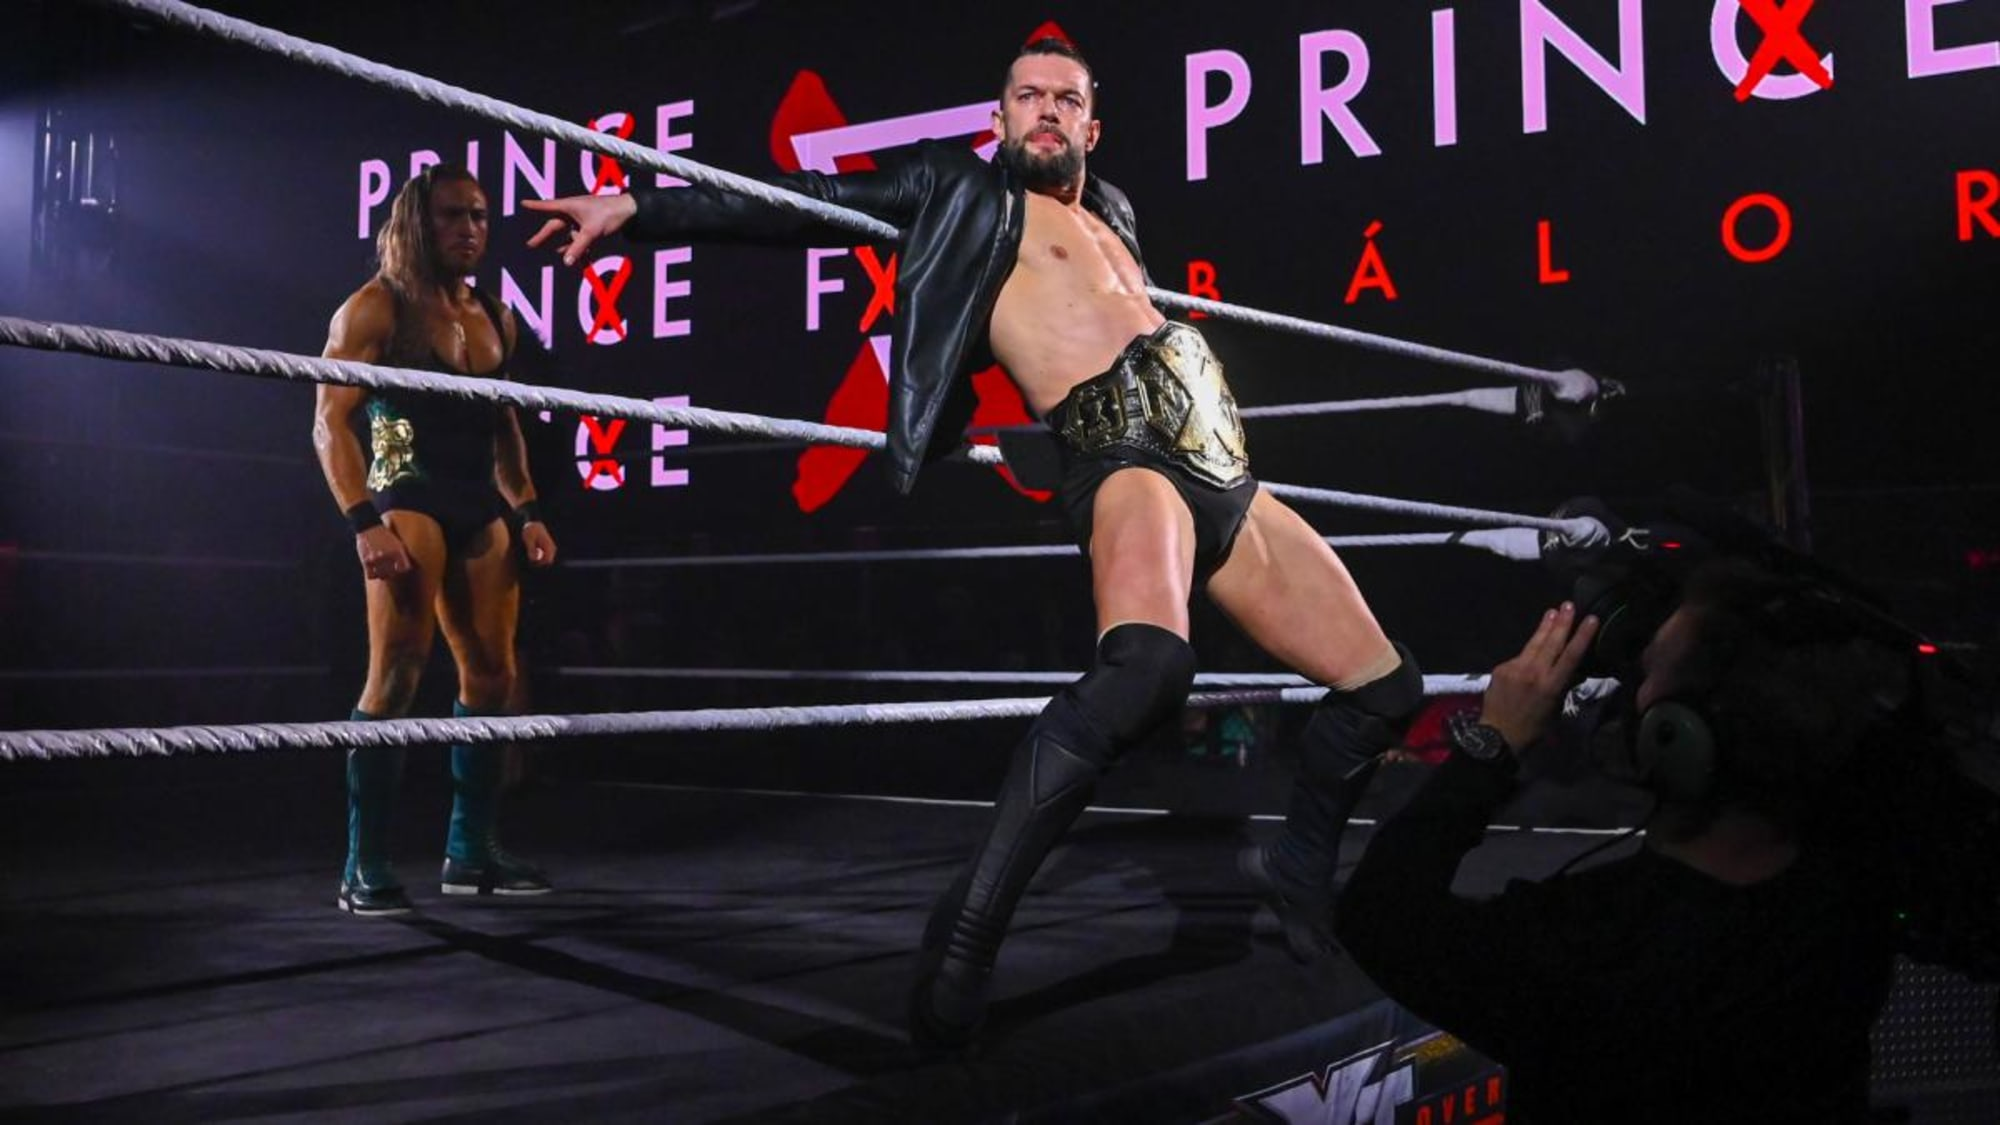 Finn Balor didn't expect this NXT run to last as long as it has